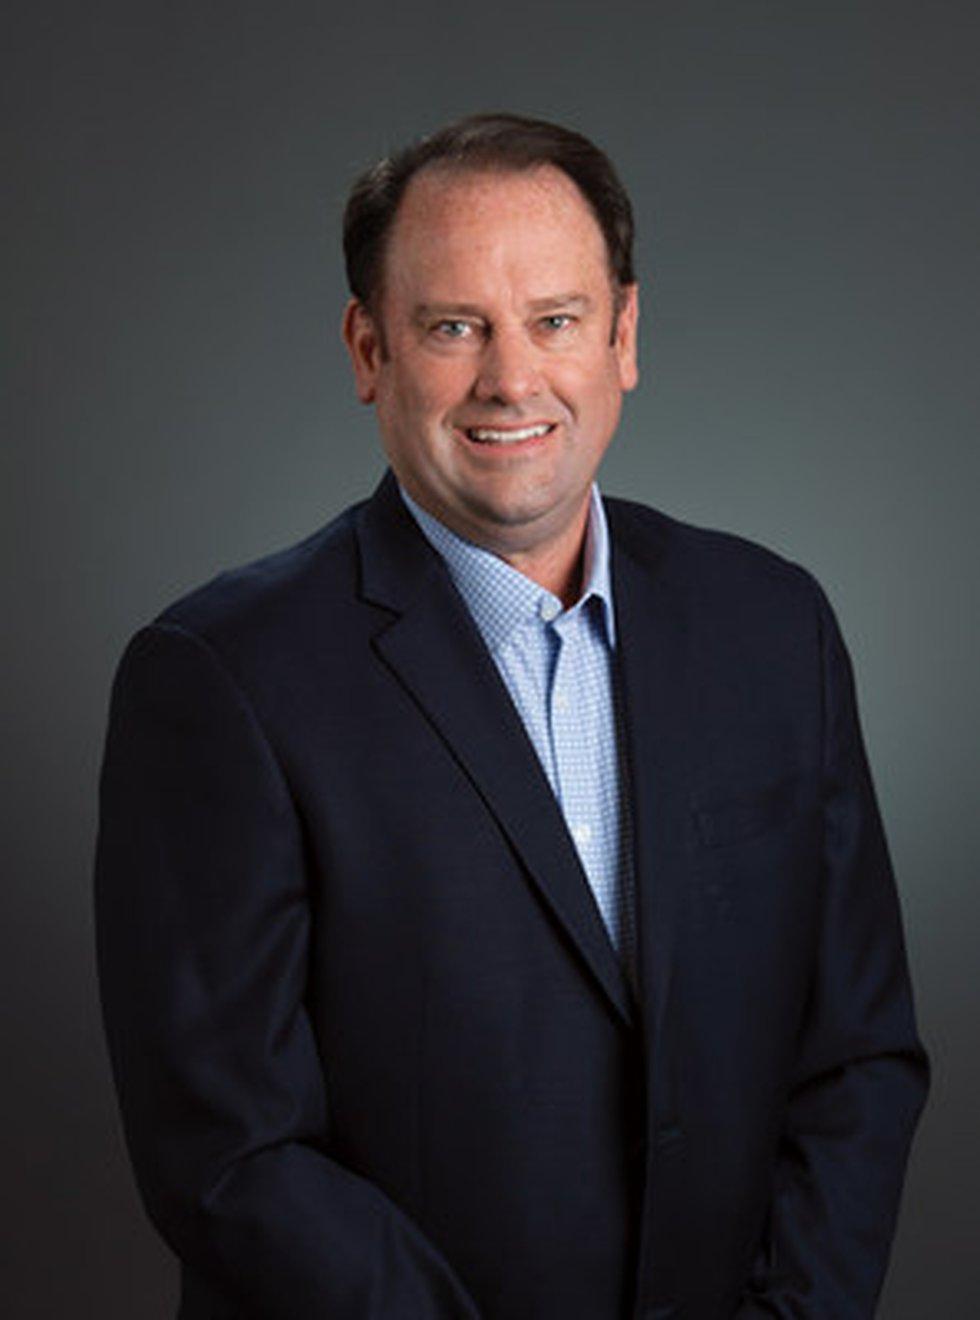 Jerry Blair, Sammons Financial Group